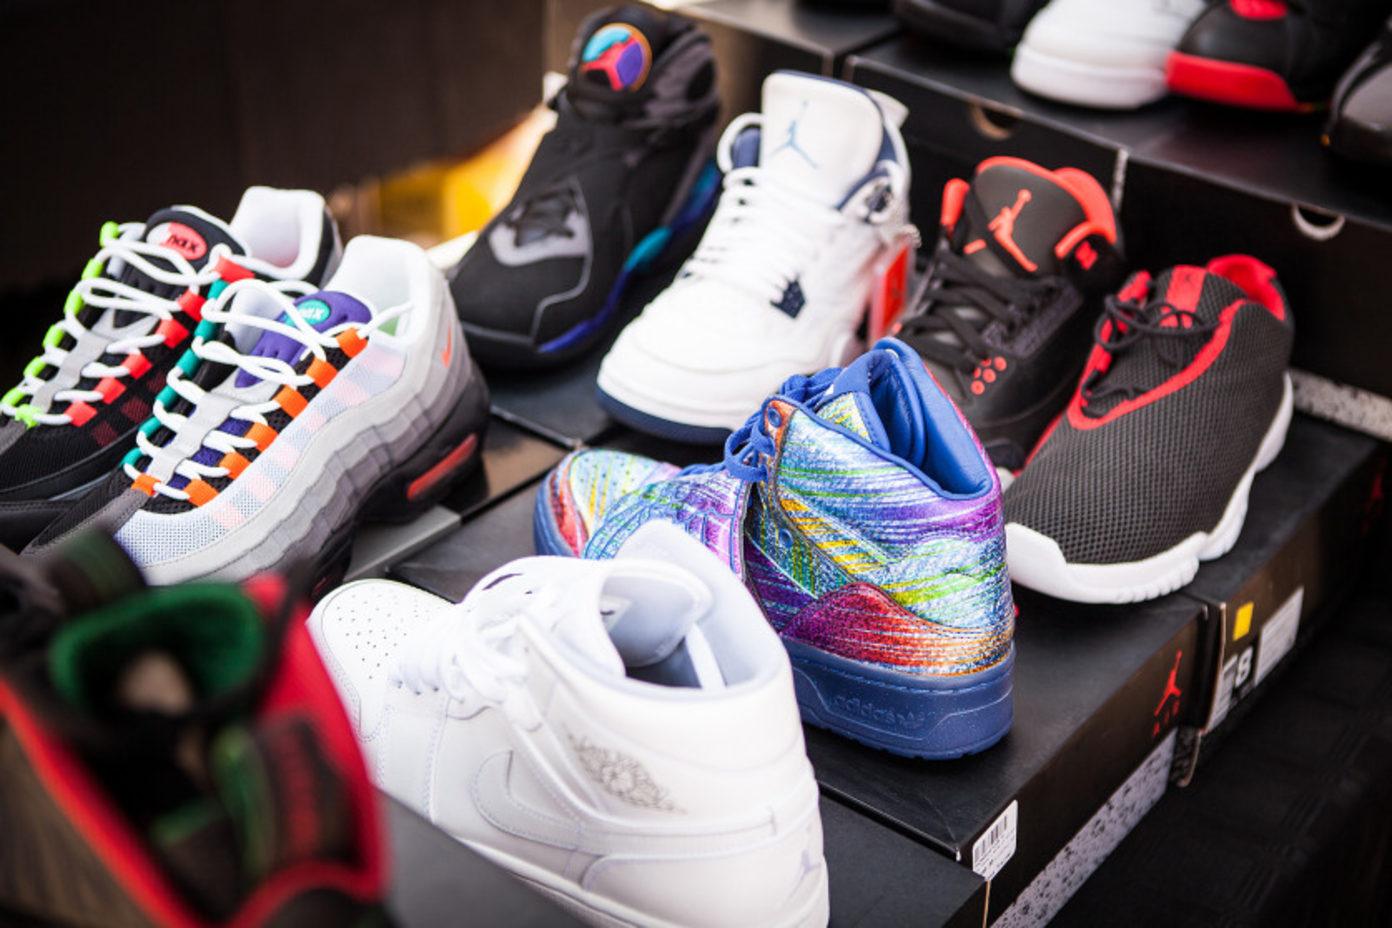 Sneak(er) Peek Africa's largest sneaker trading event – Sneaker Exchange